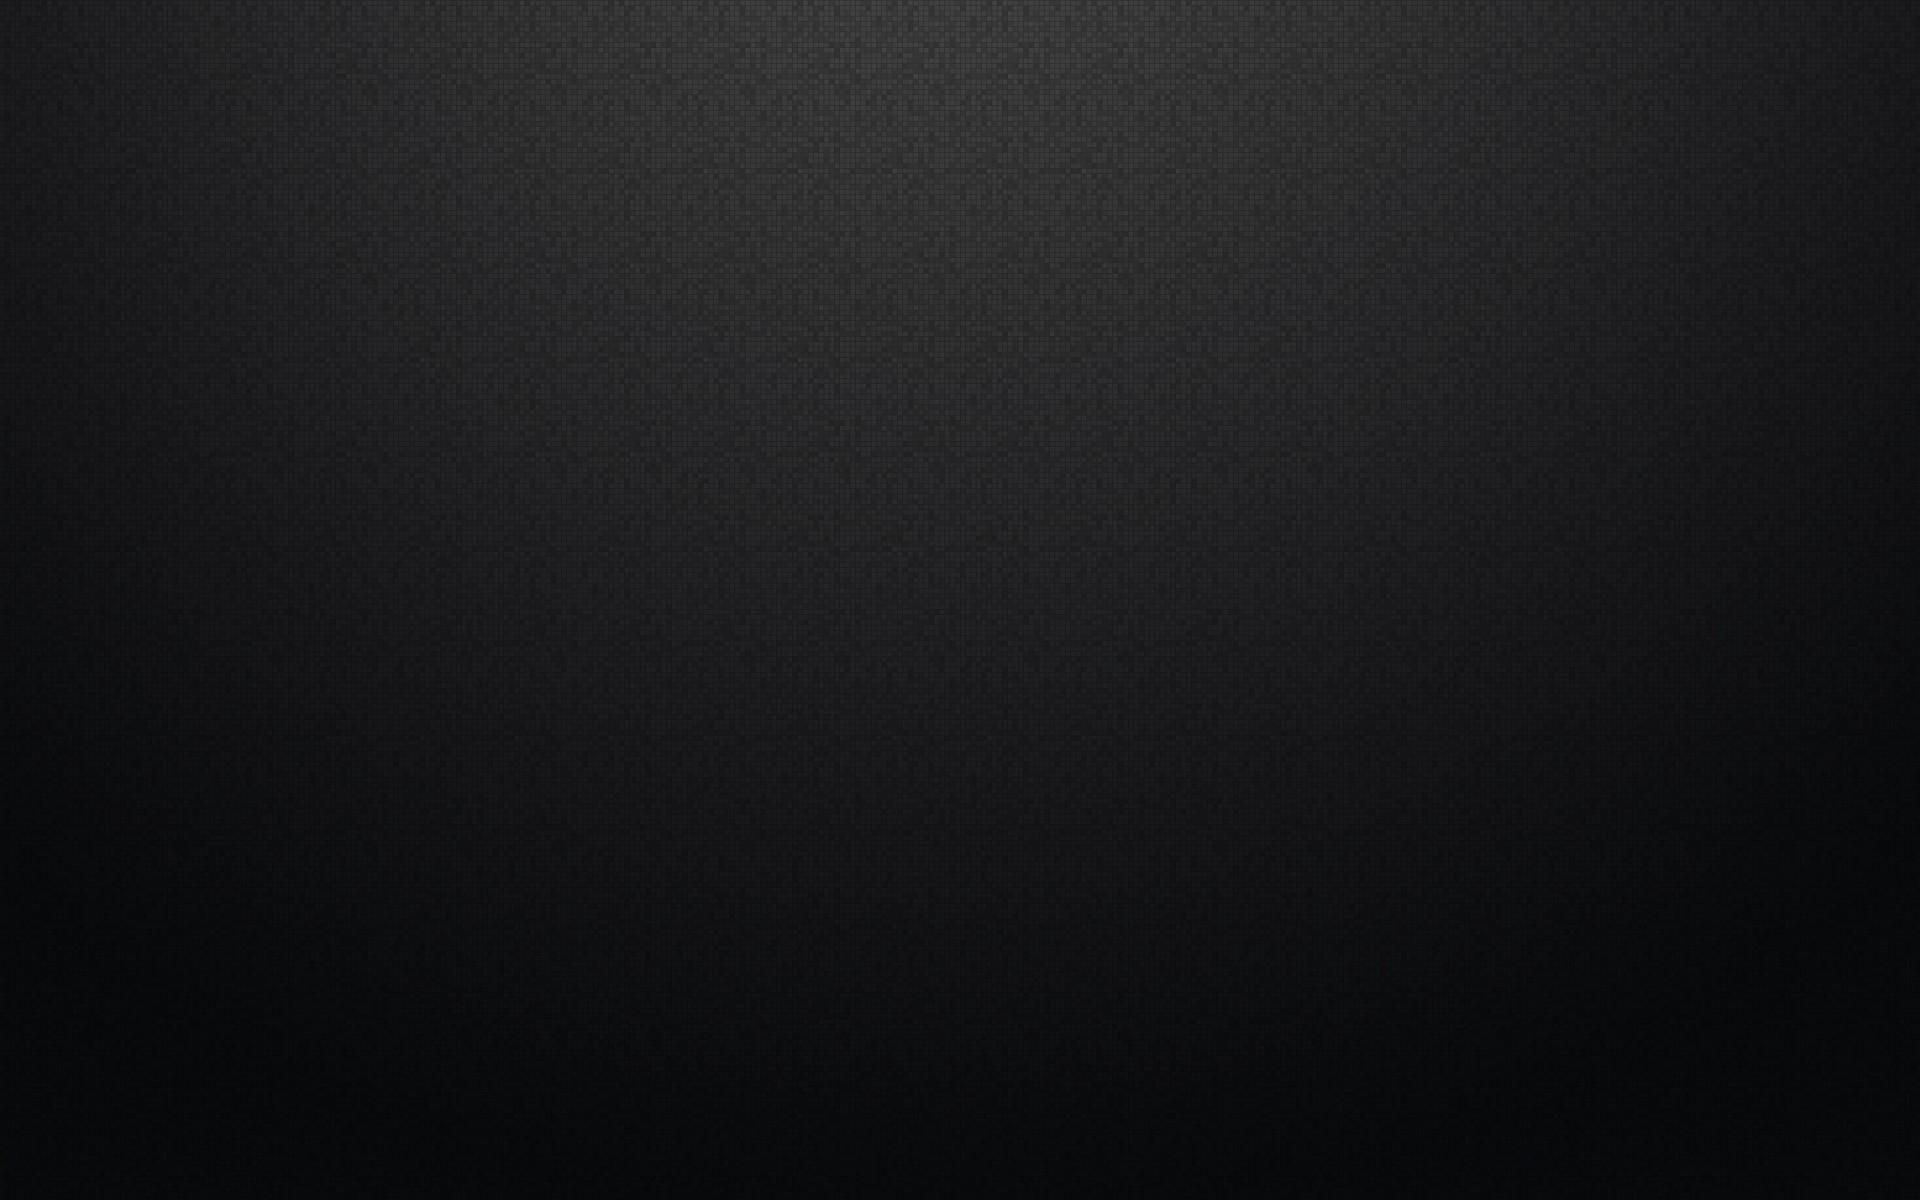 black backgrounds 6 free wallpaper